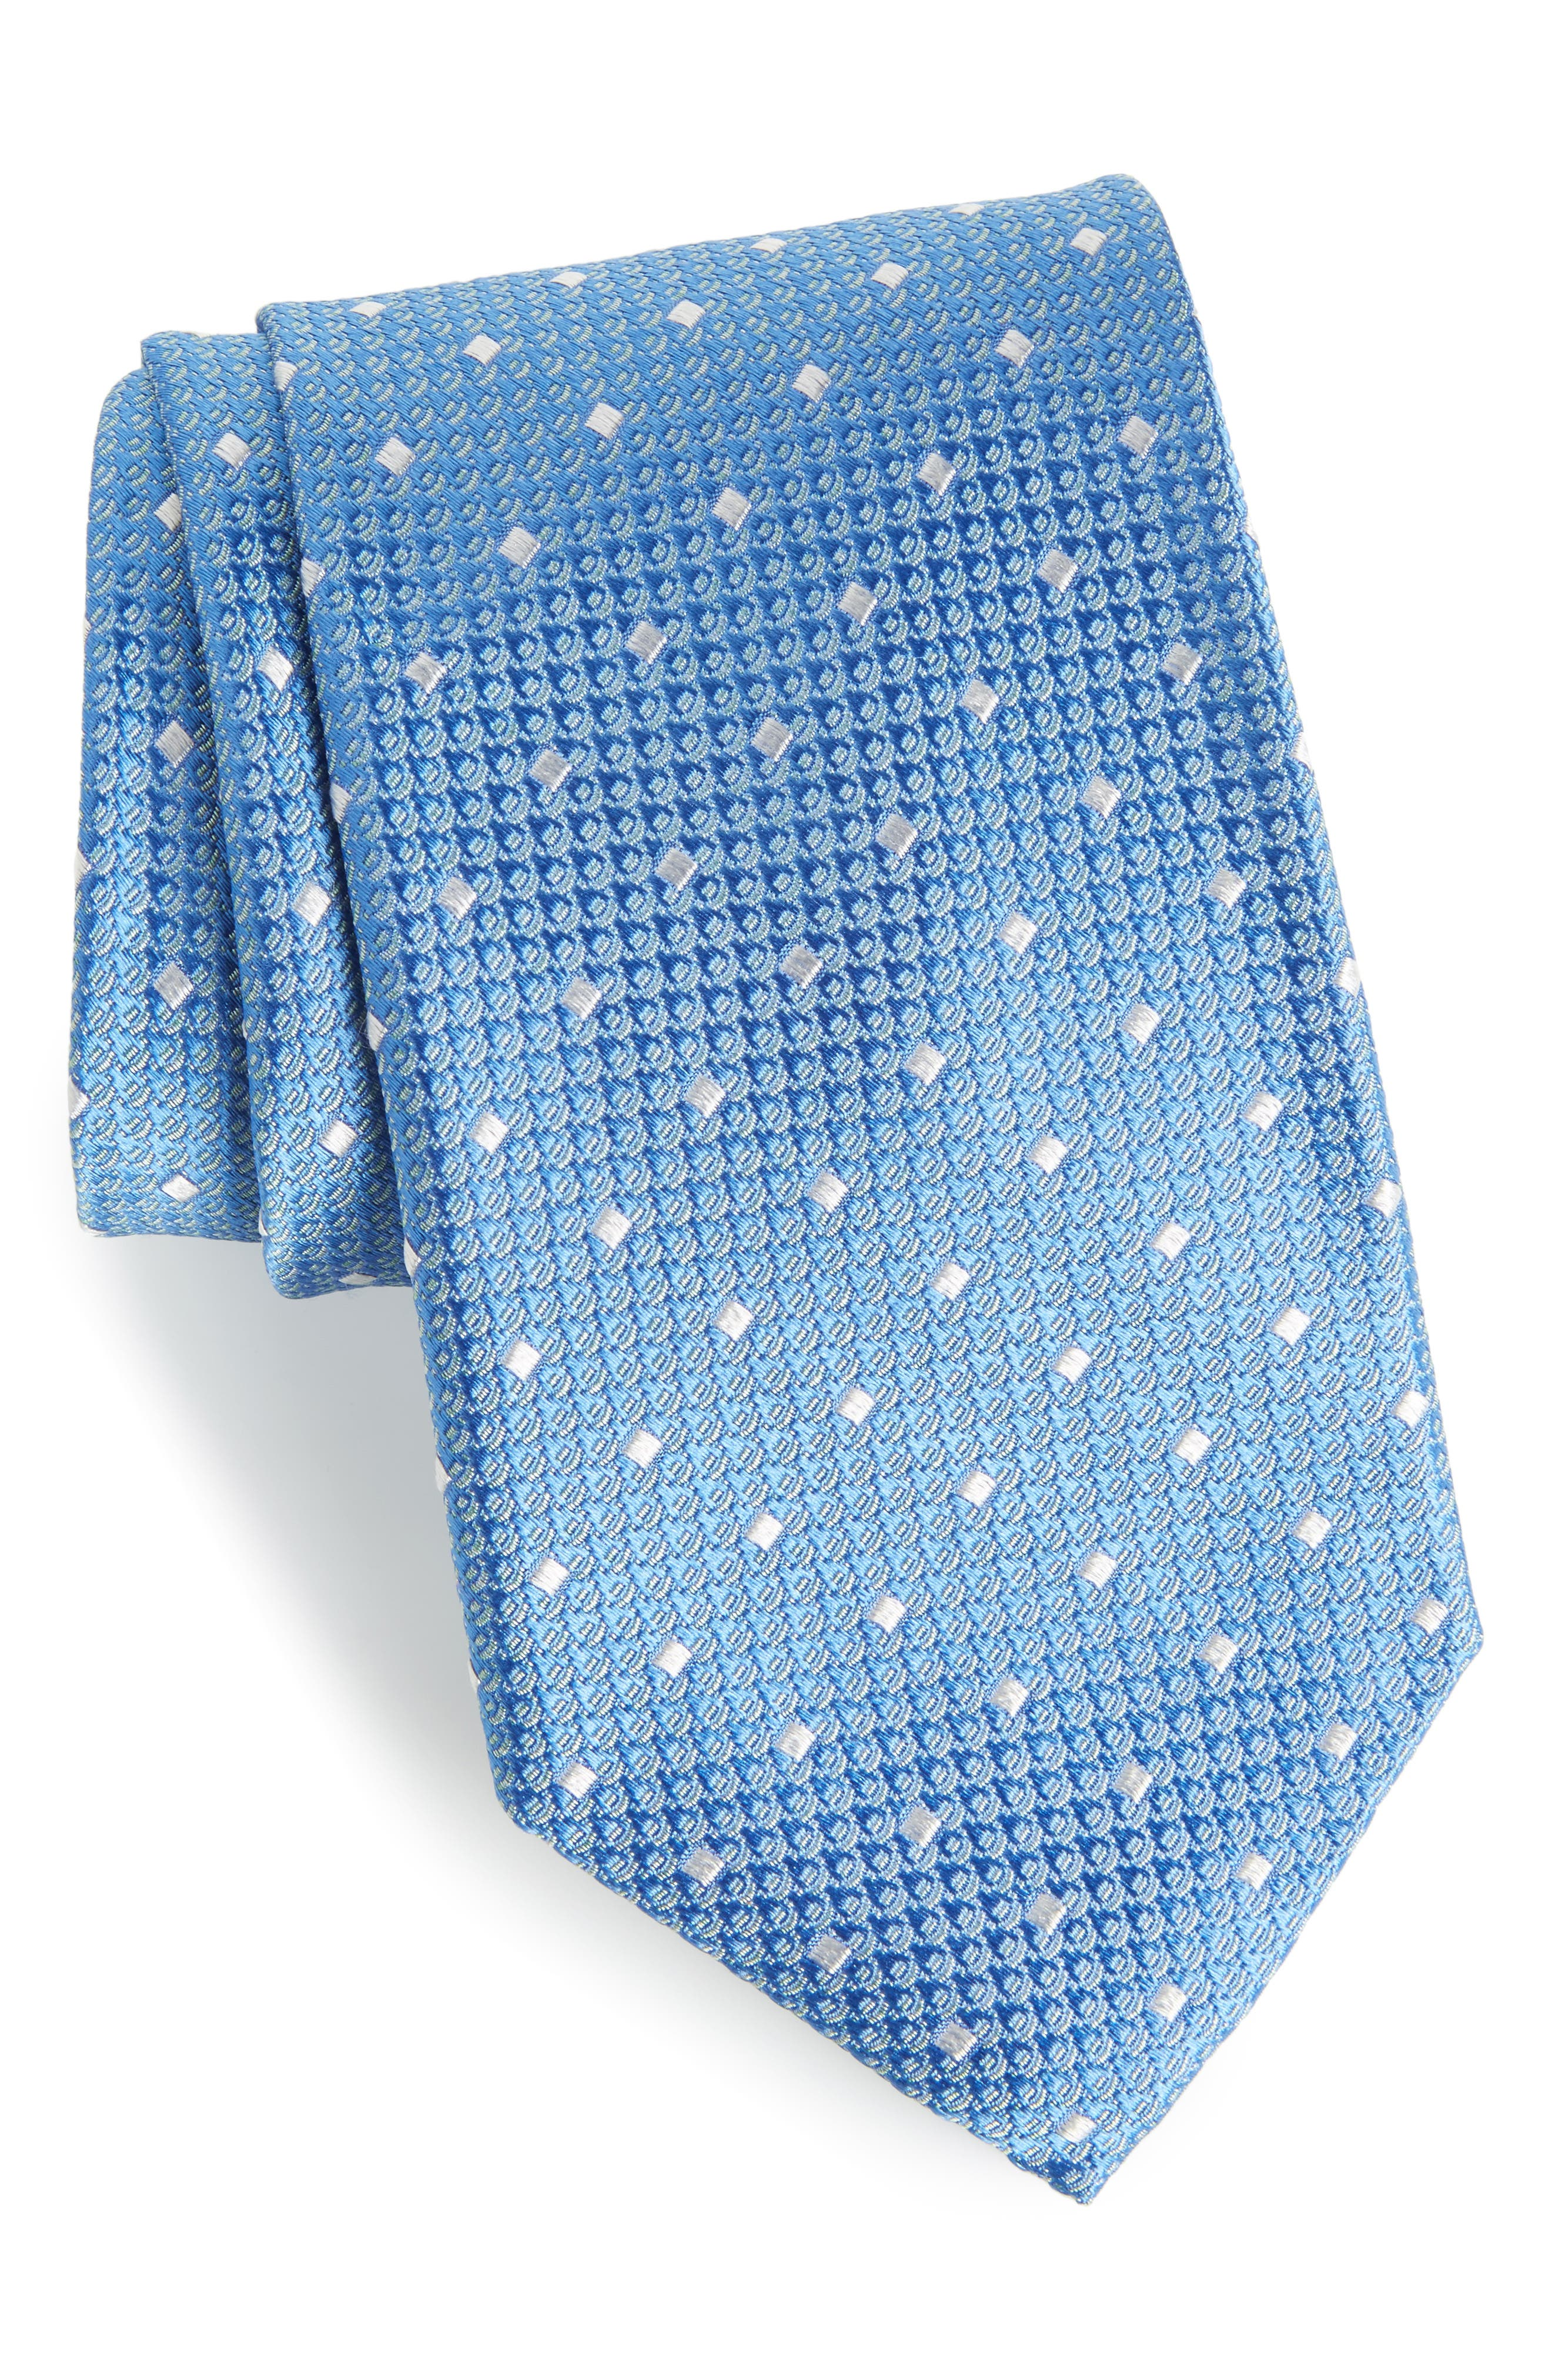 Main Image - Nordstrom Men's Shop Contrada Dot Silk Tie